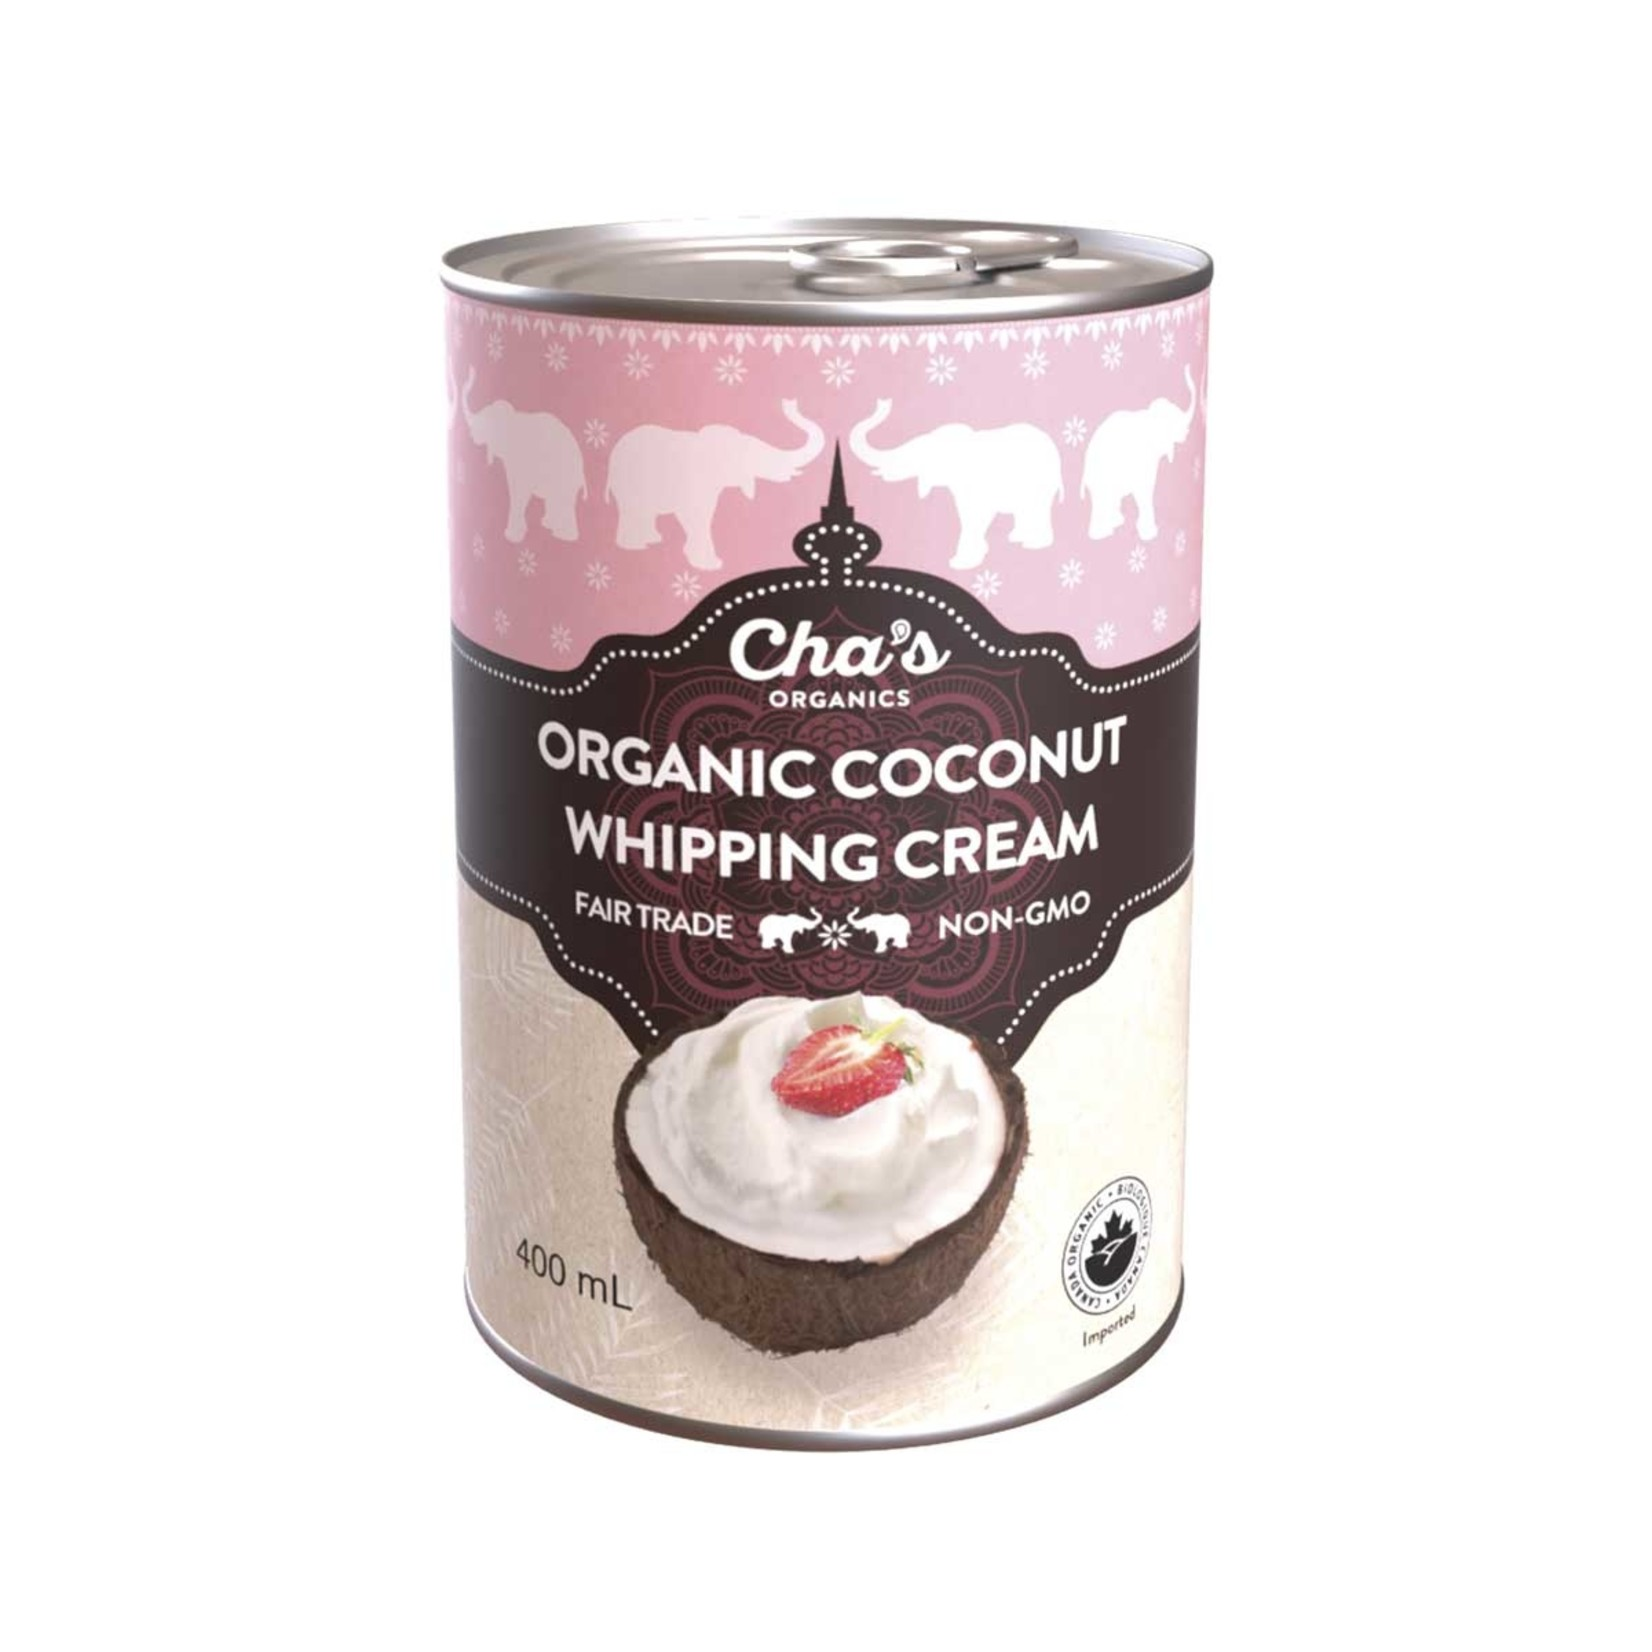 Cha's Organics Organic Coconut Whipping Cream 400ml